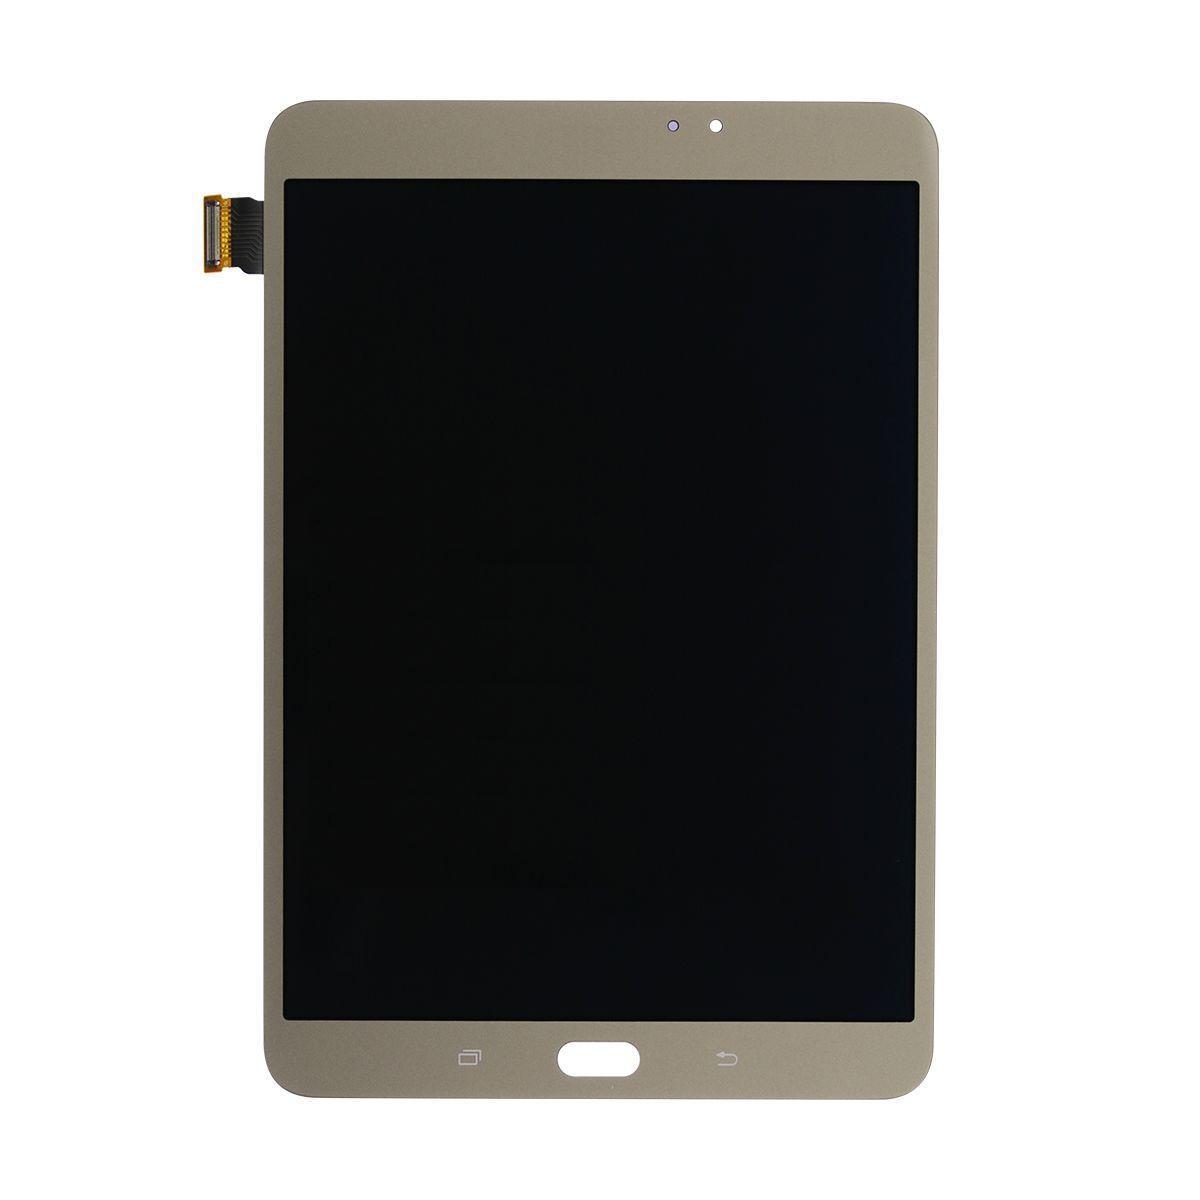 Дисплей для планшета Samsung Galaxy Tab S2 8.0 T710 (Wi-Fi) + Touchscreen Gold